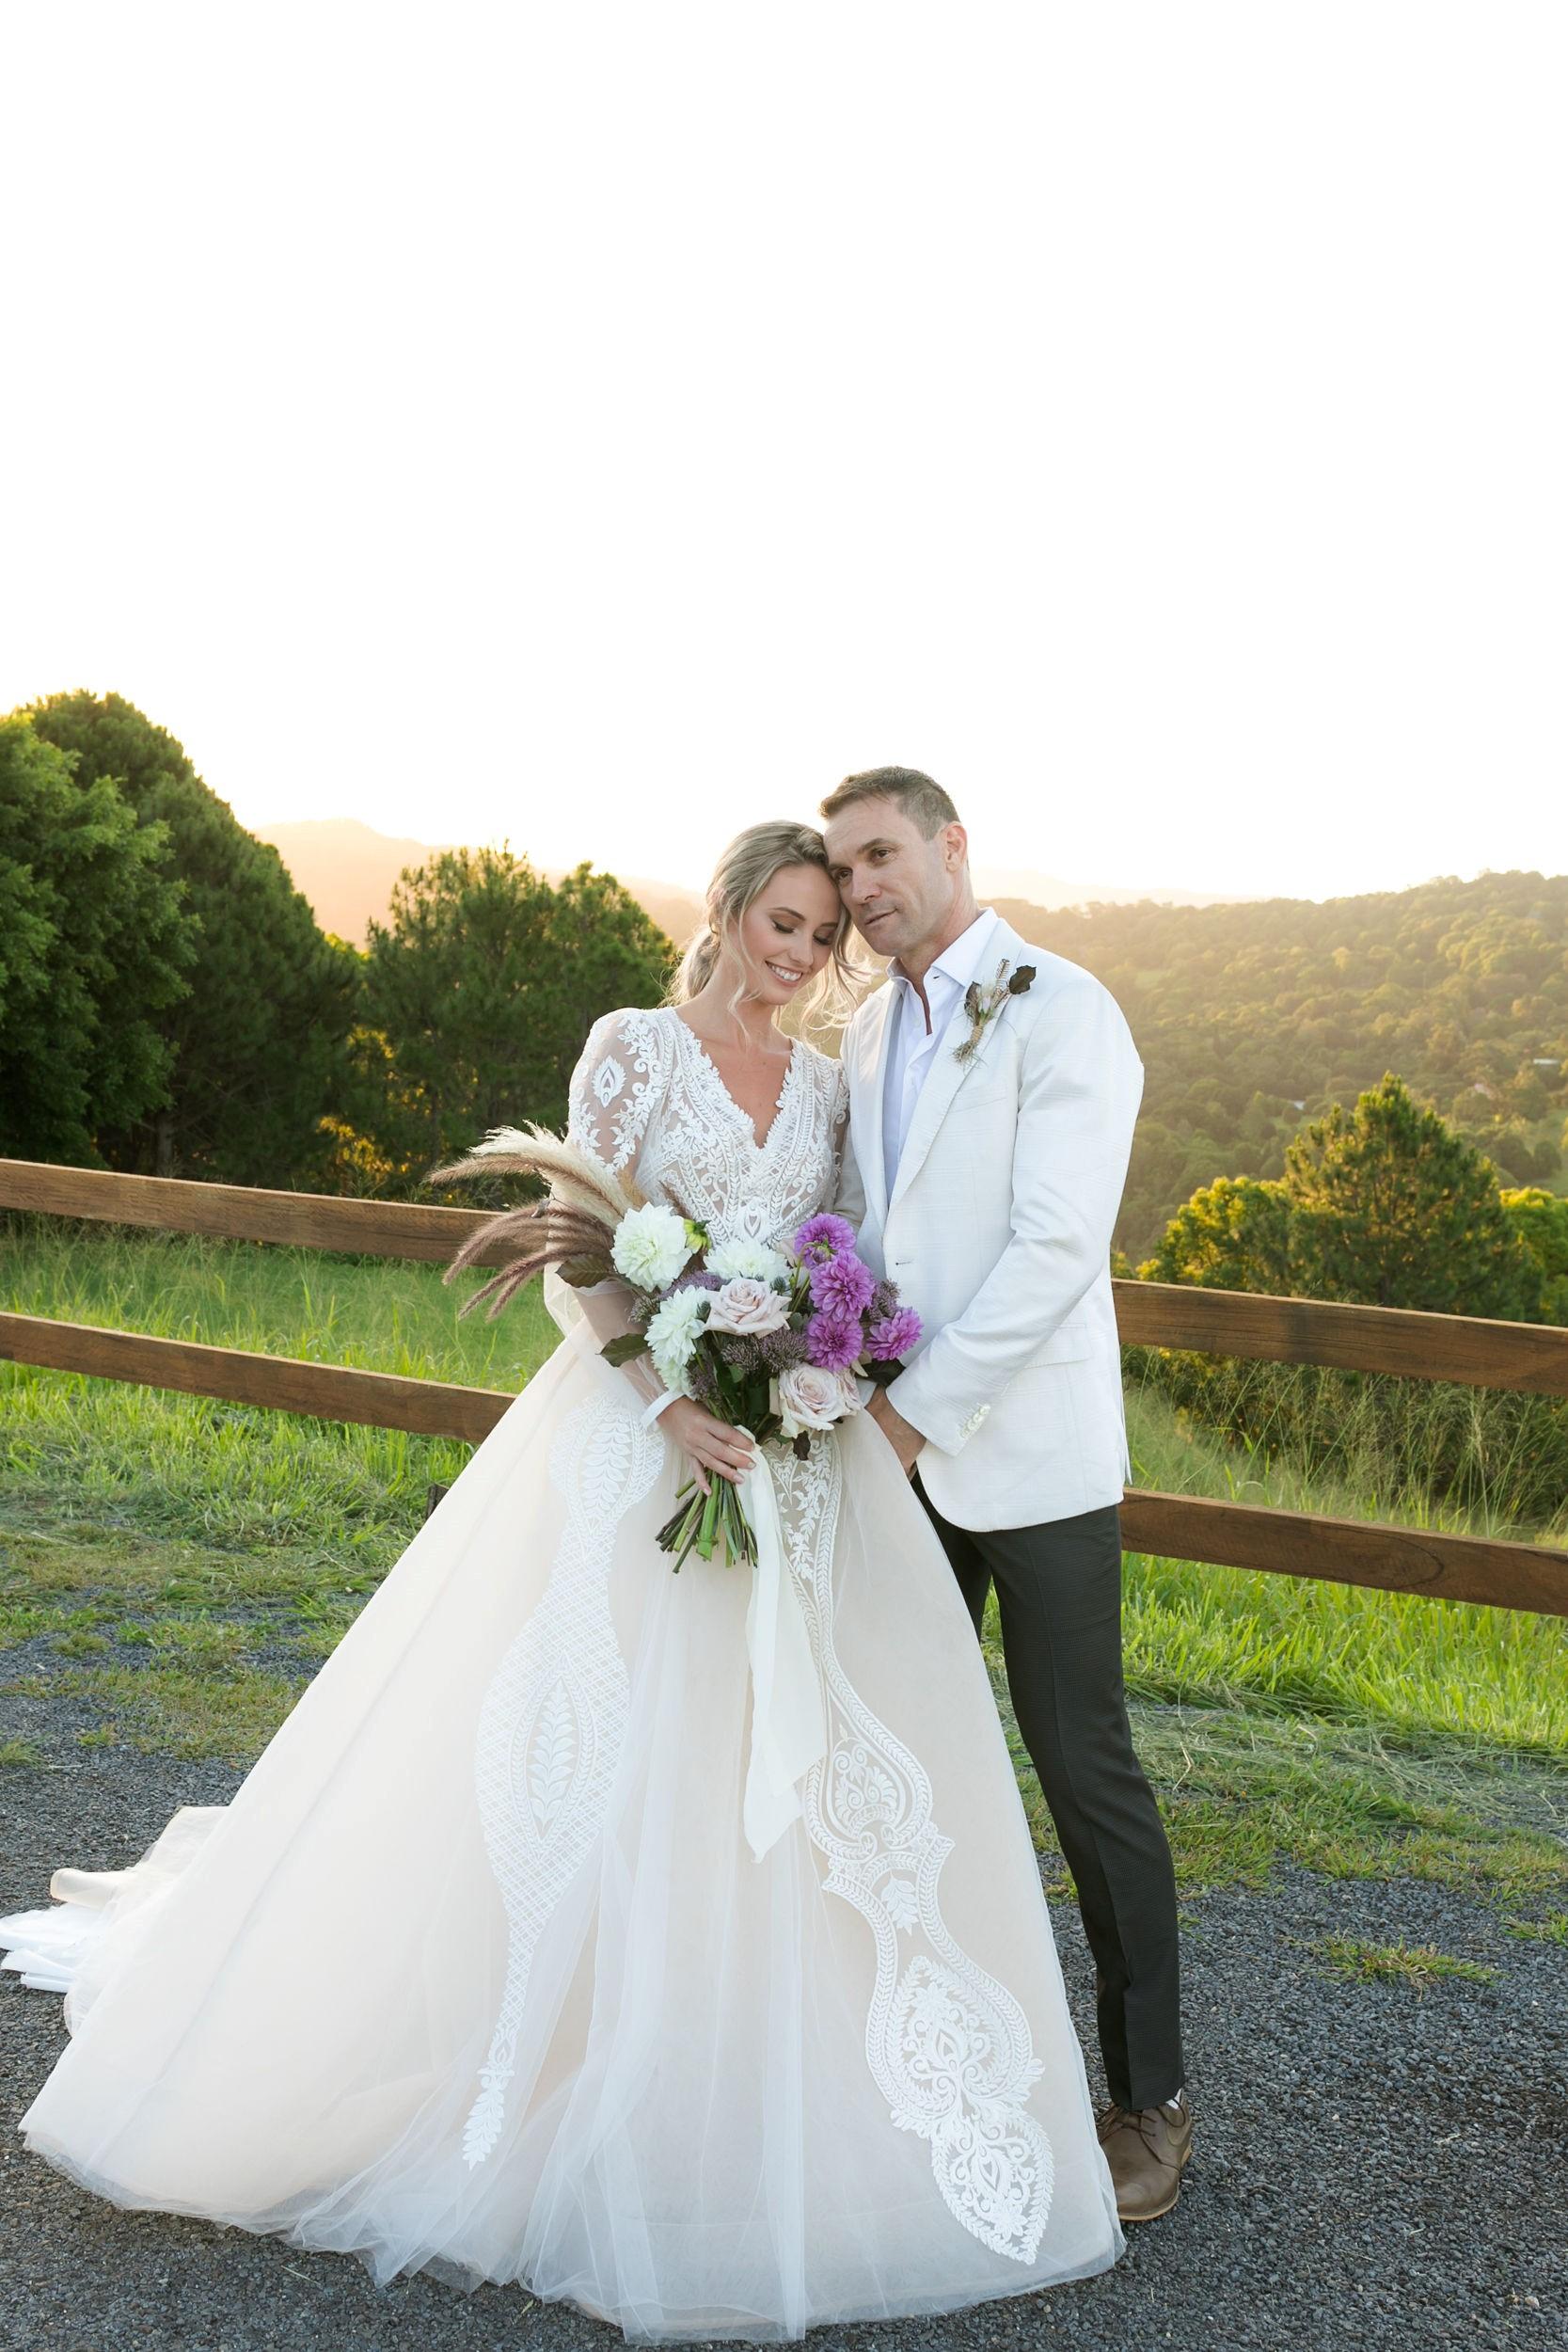 Wedding photo pic 8